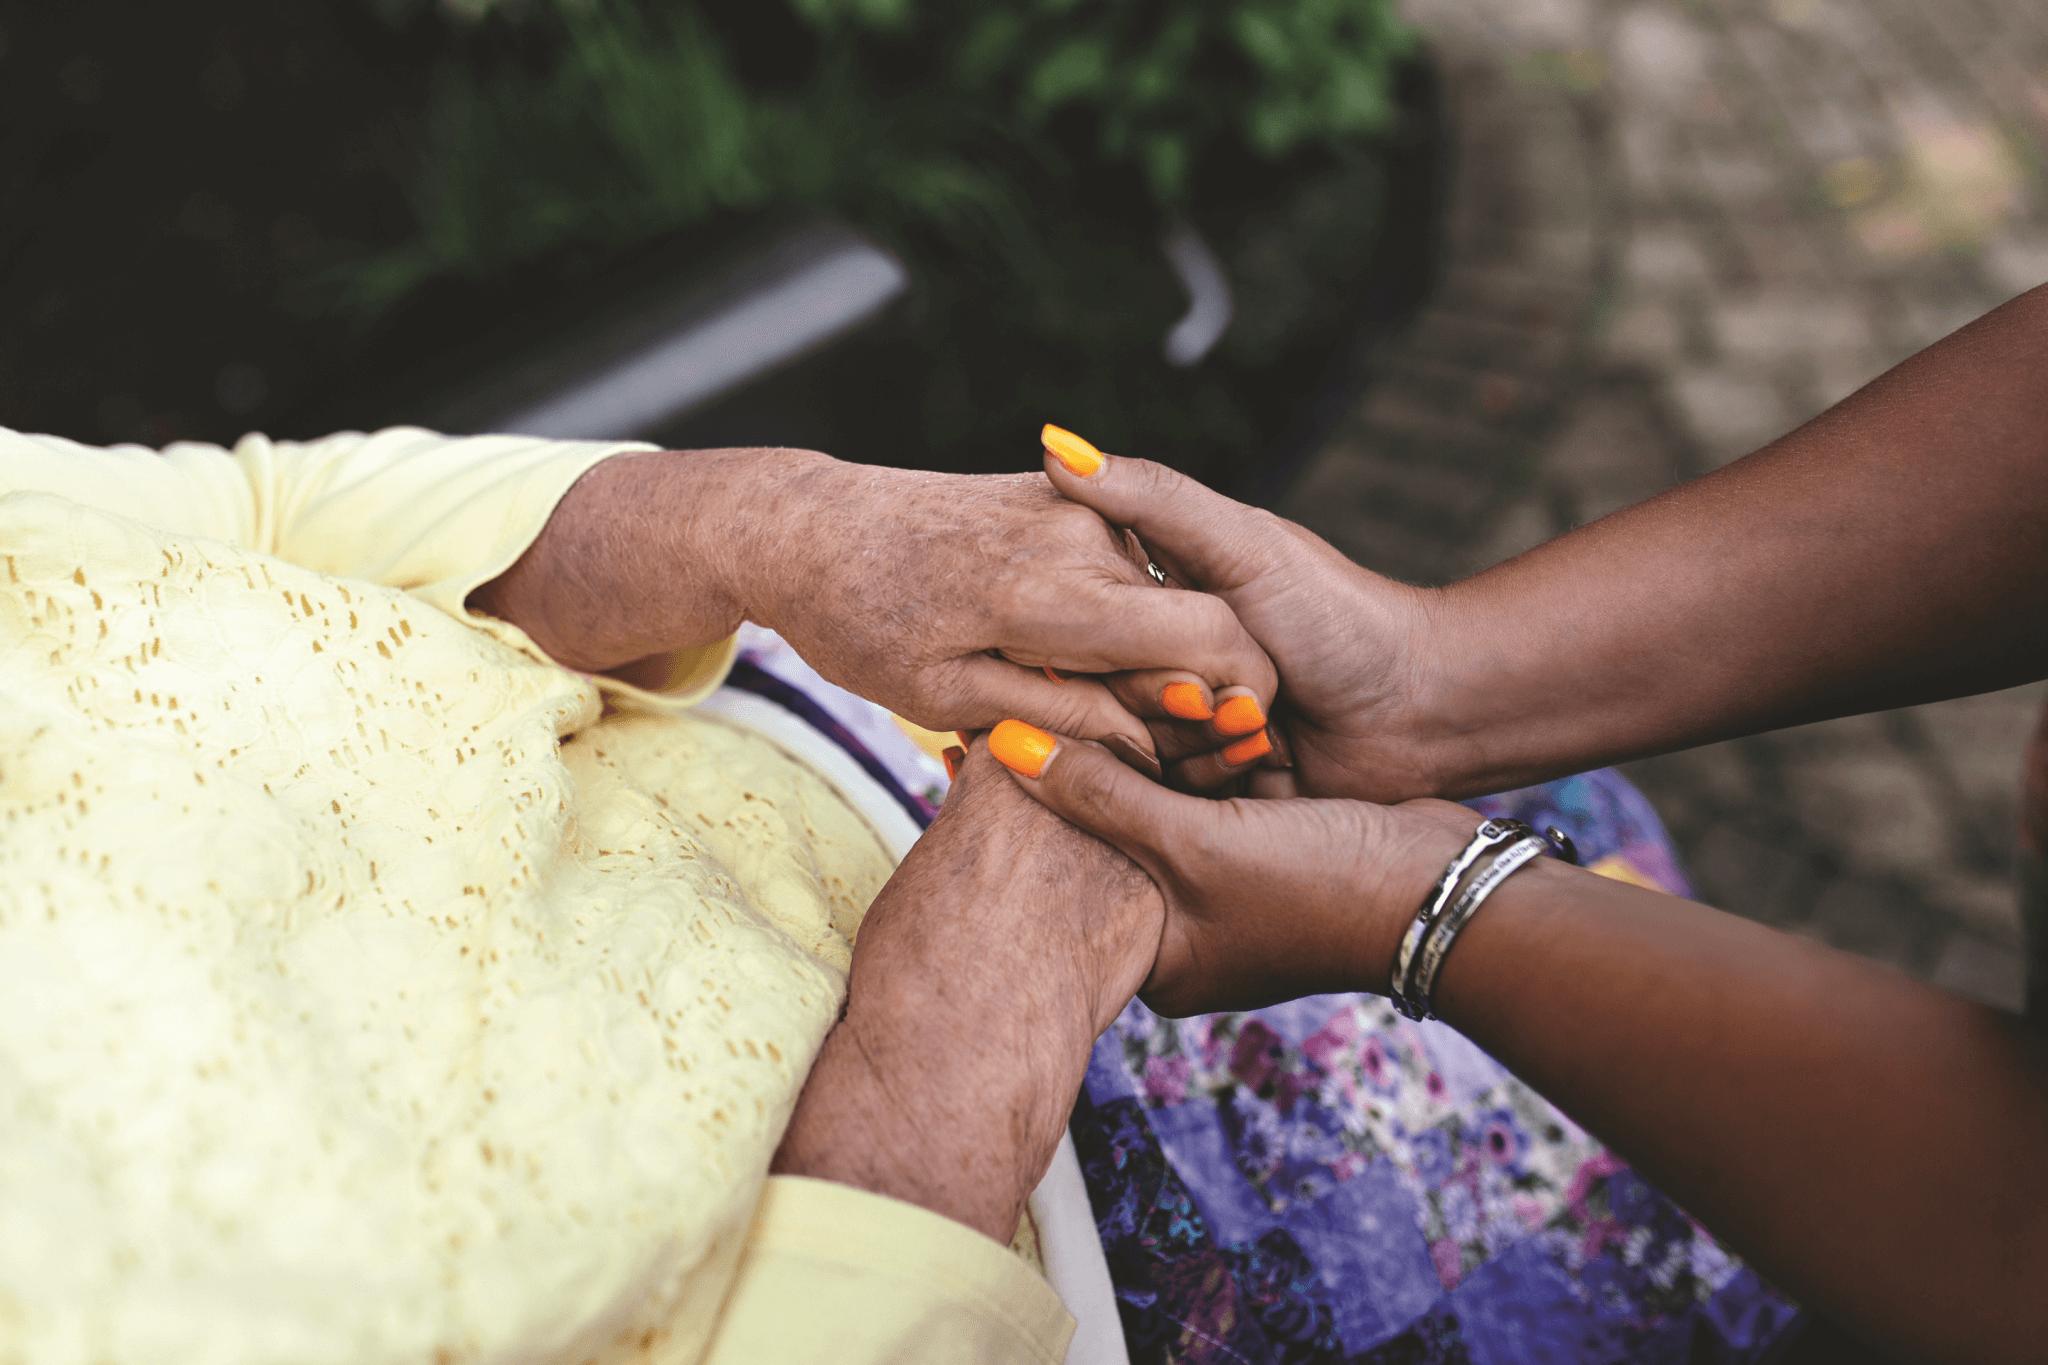 Delivering support to older adults